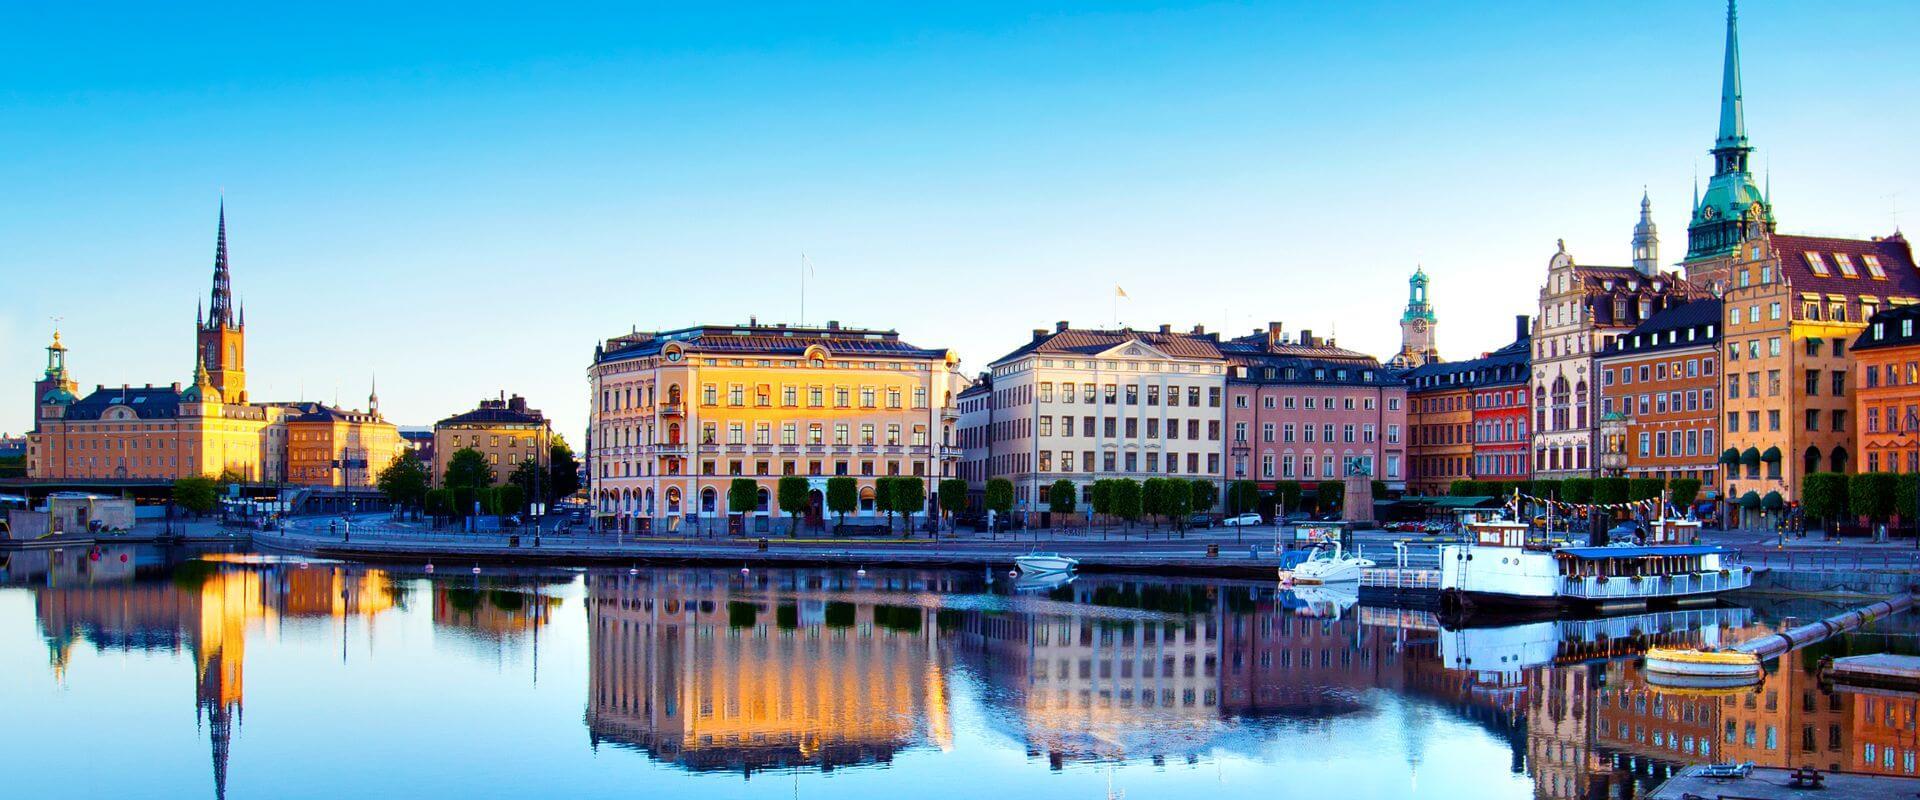 Bild Stockholm